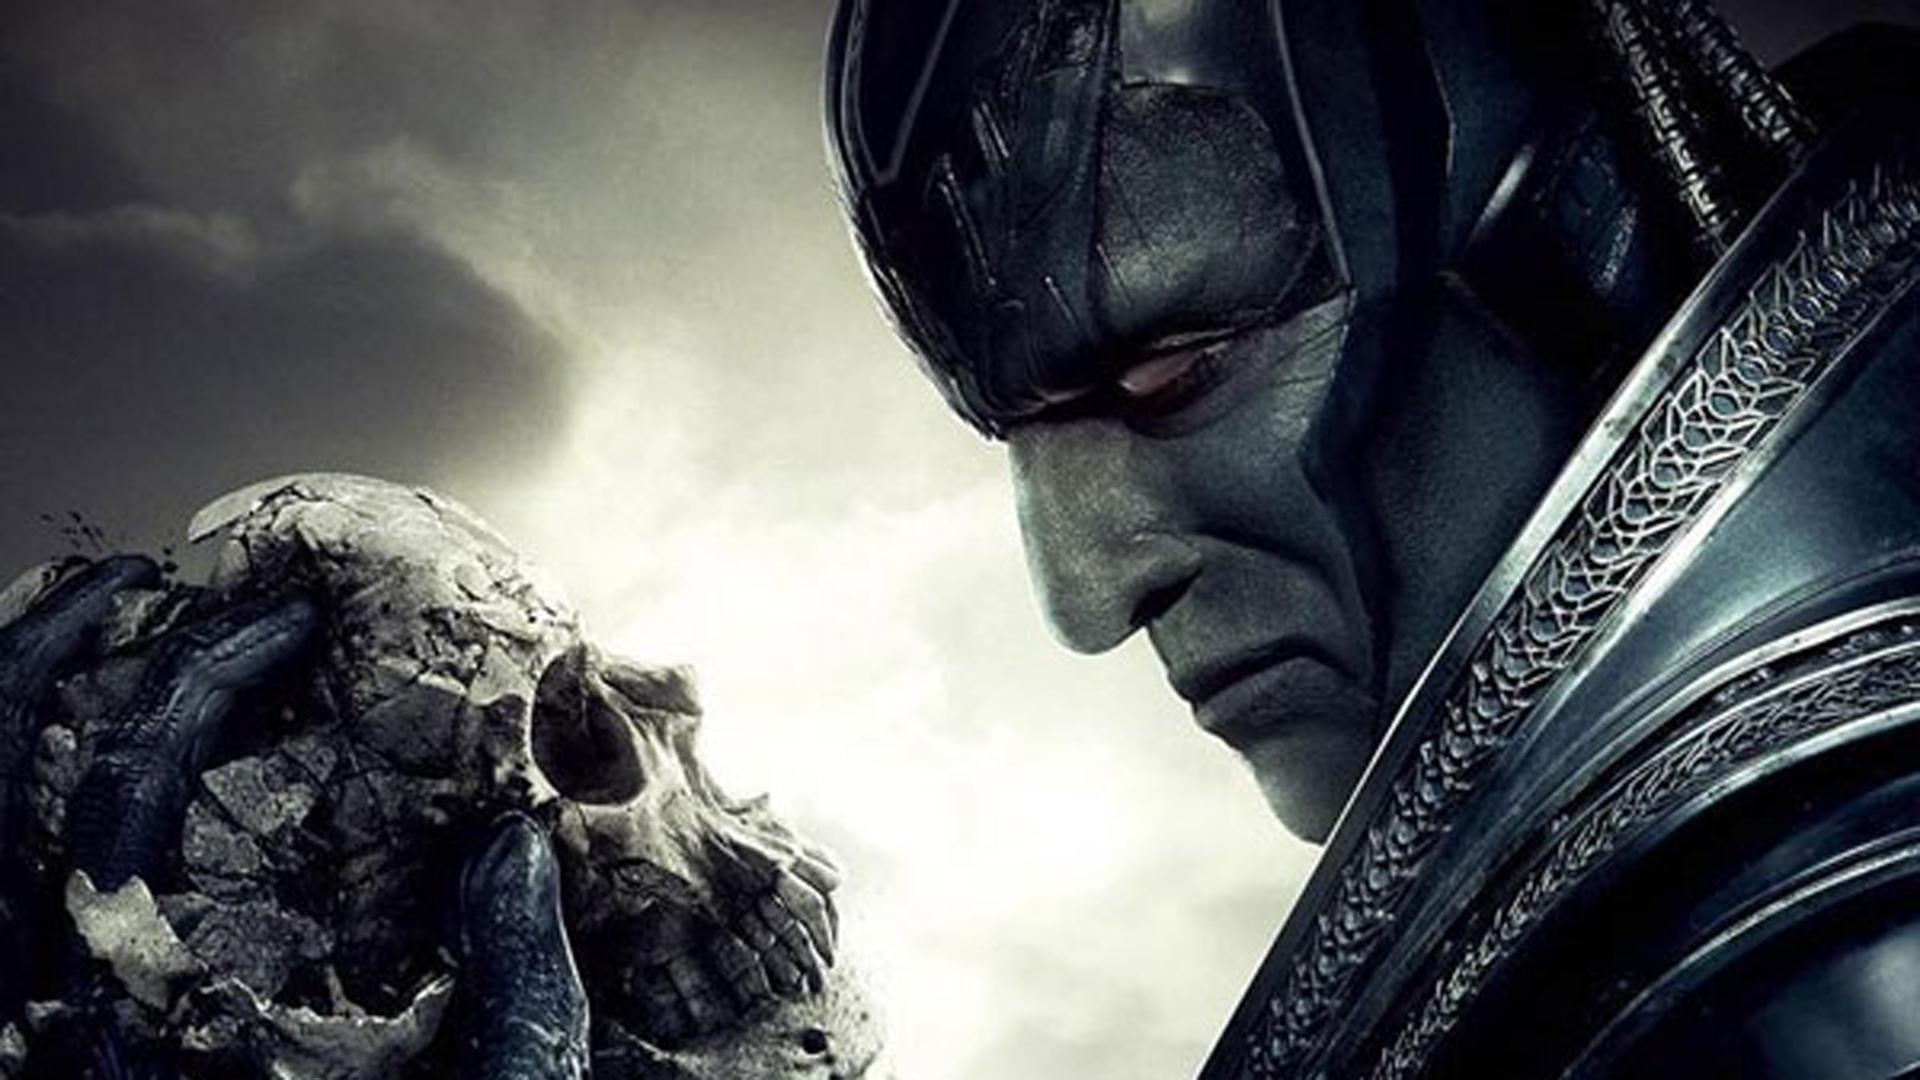 X Men Apocalypse High Quality Wallpapers